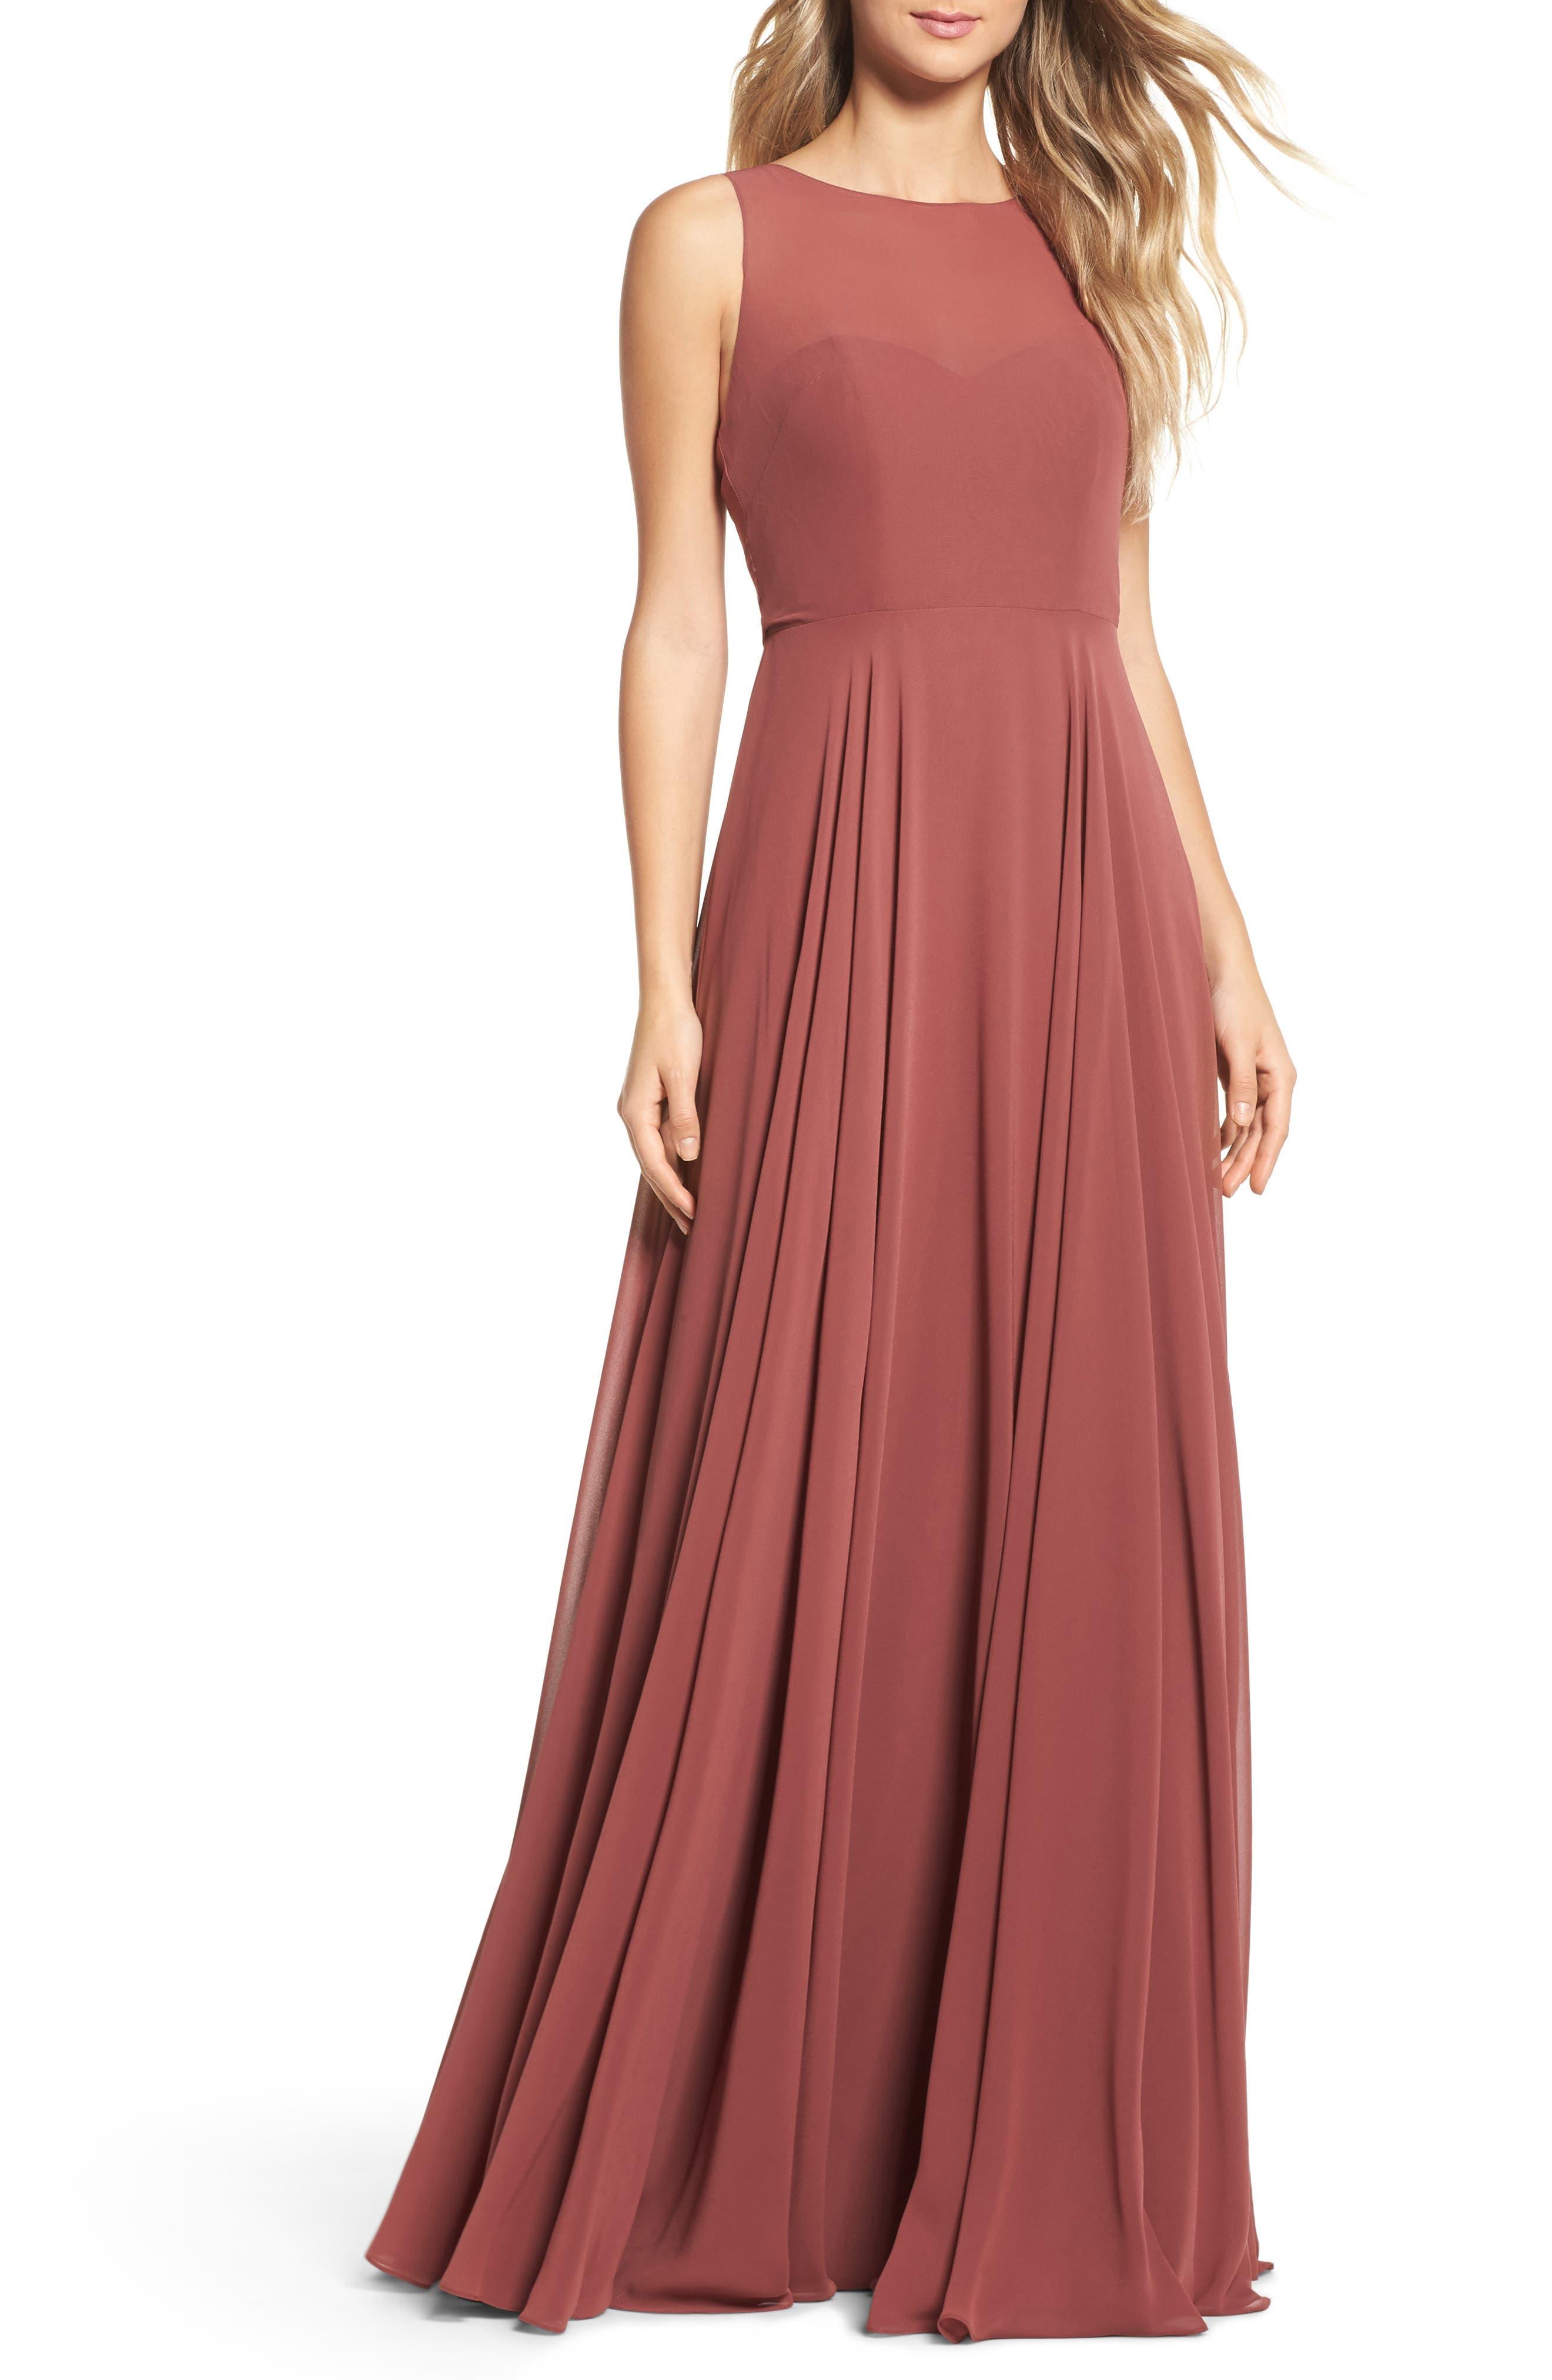 Jenny Yoo Elizabeth Chiffon Gown, Brown